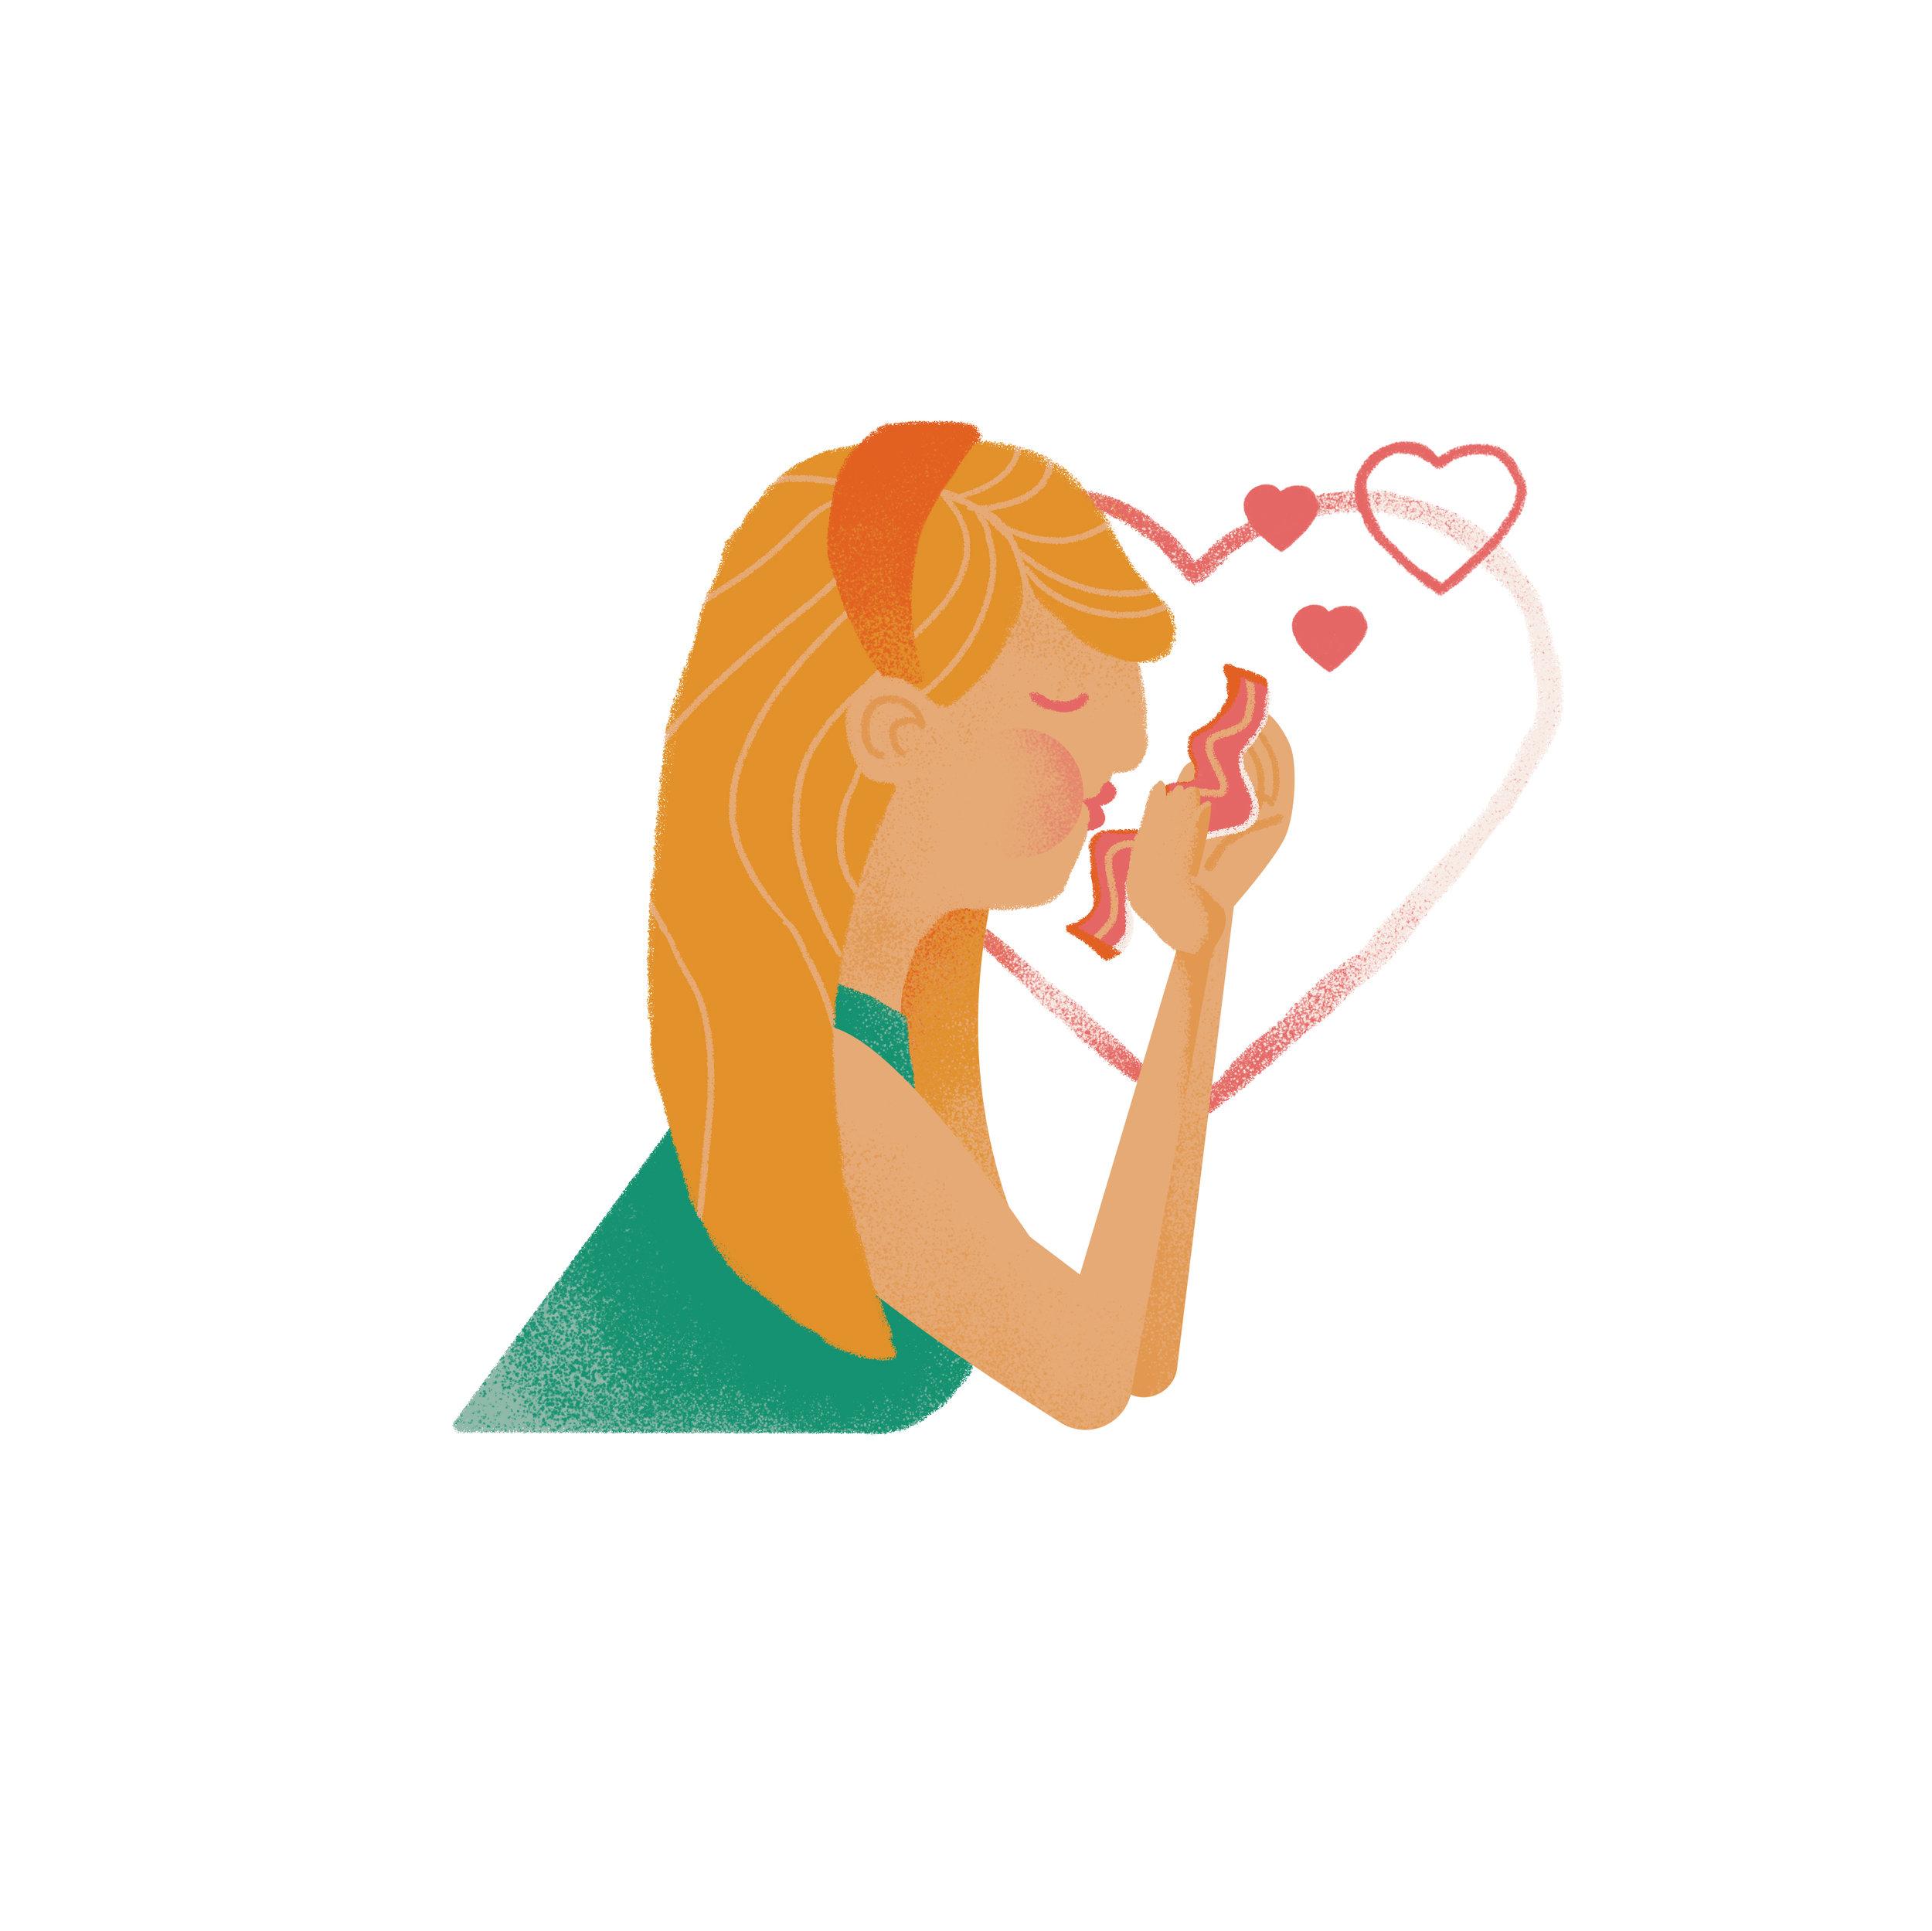 HOU-170821_LOVE_DATING_Love-For-Bacon-01.jpg